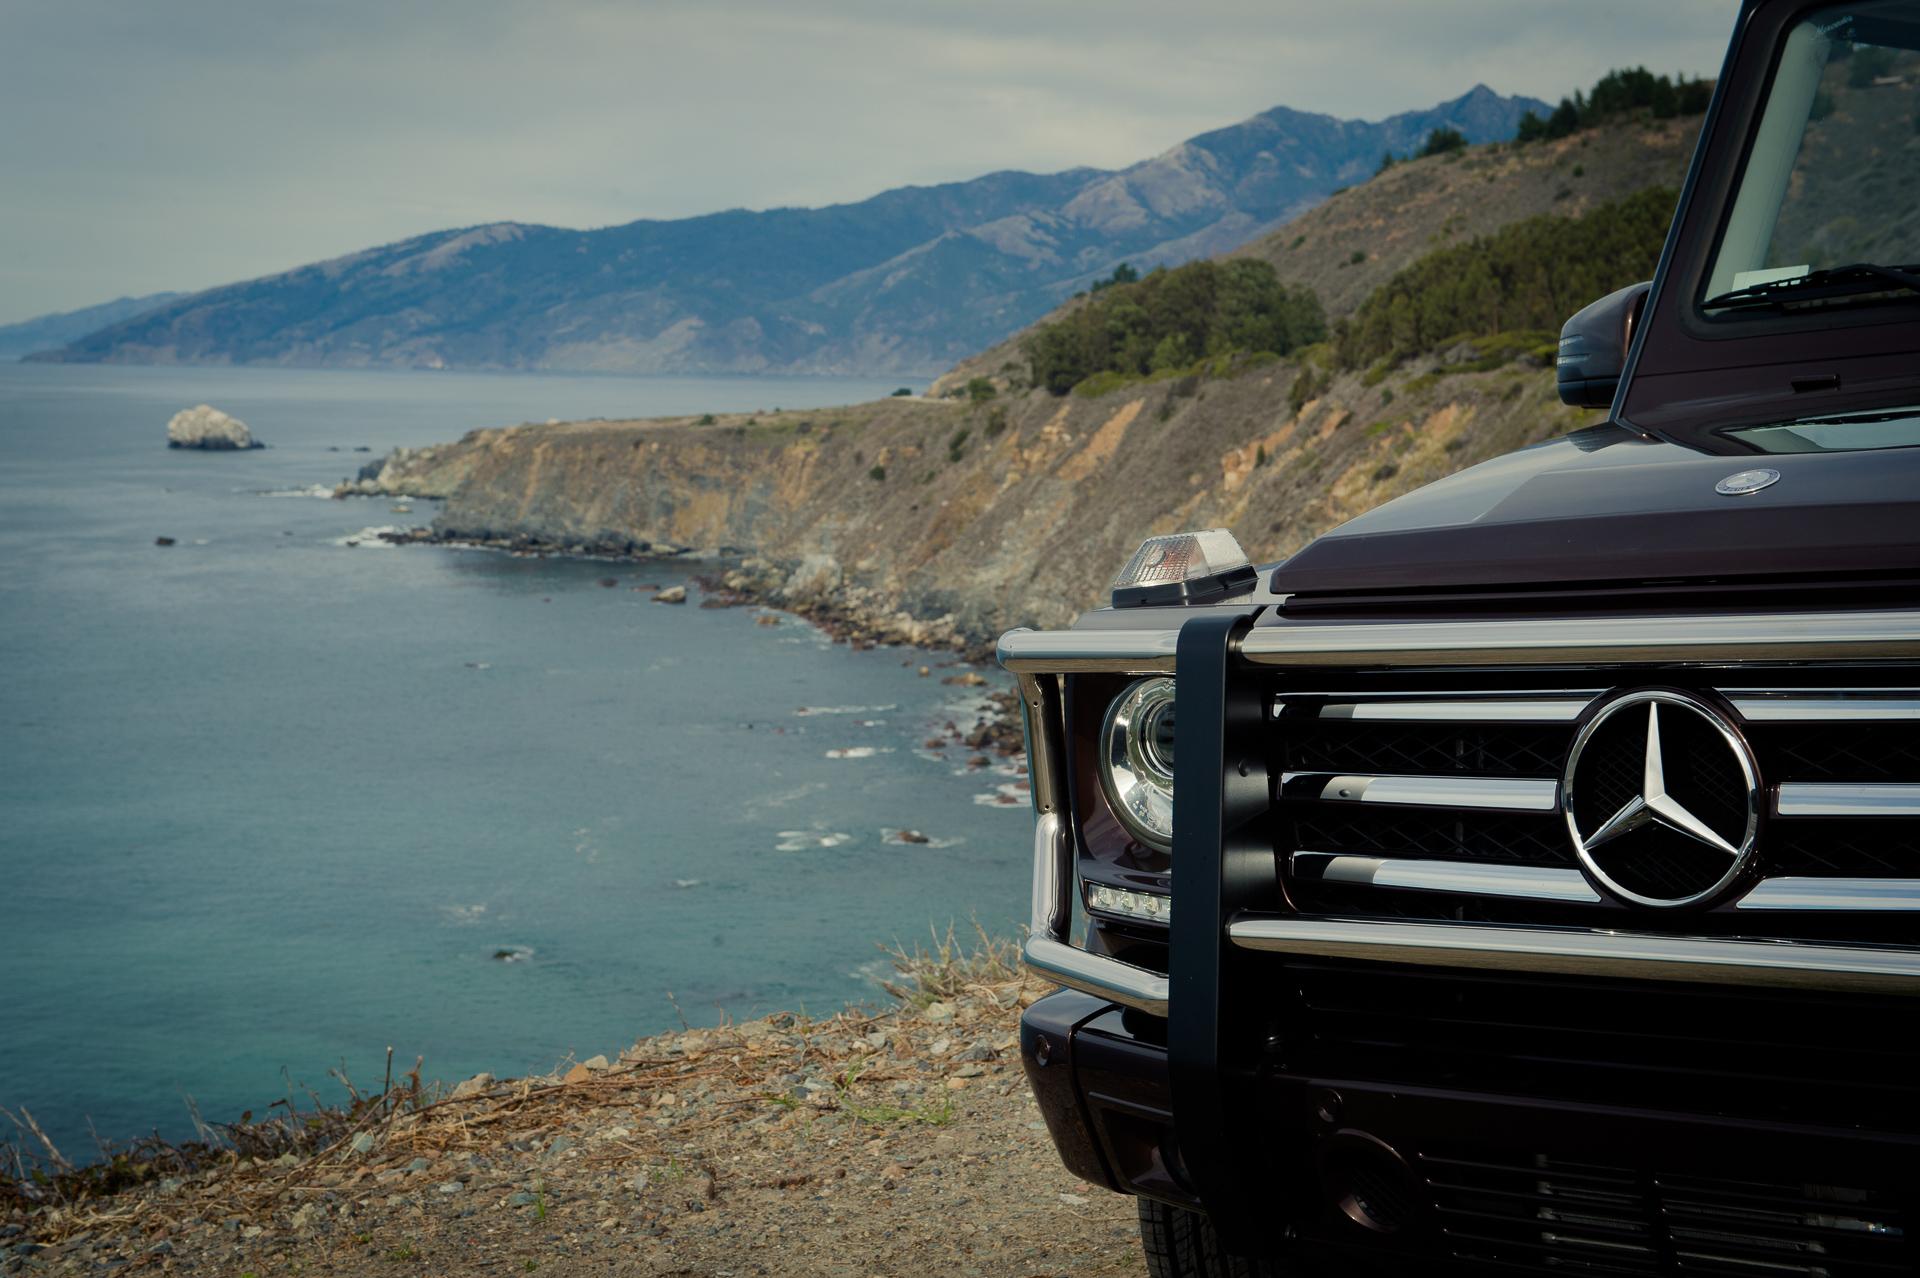 2014-Mercedes-Benz-G500-G550-braun-Kalifornien-mbrt14-02